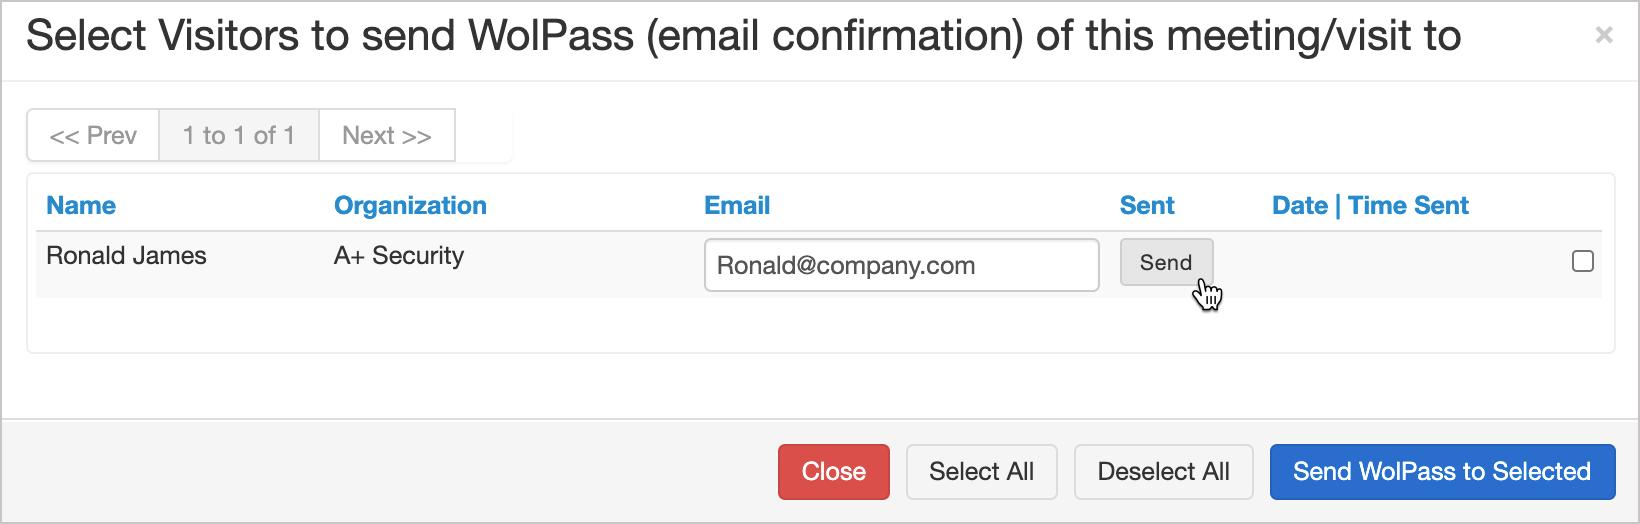 Send-WolPass-Confirmation.png